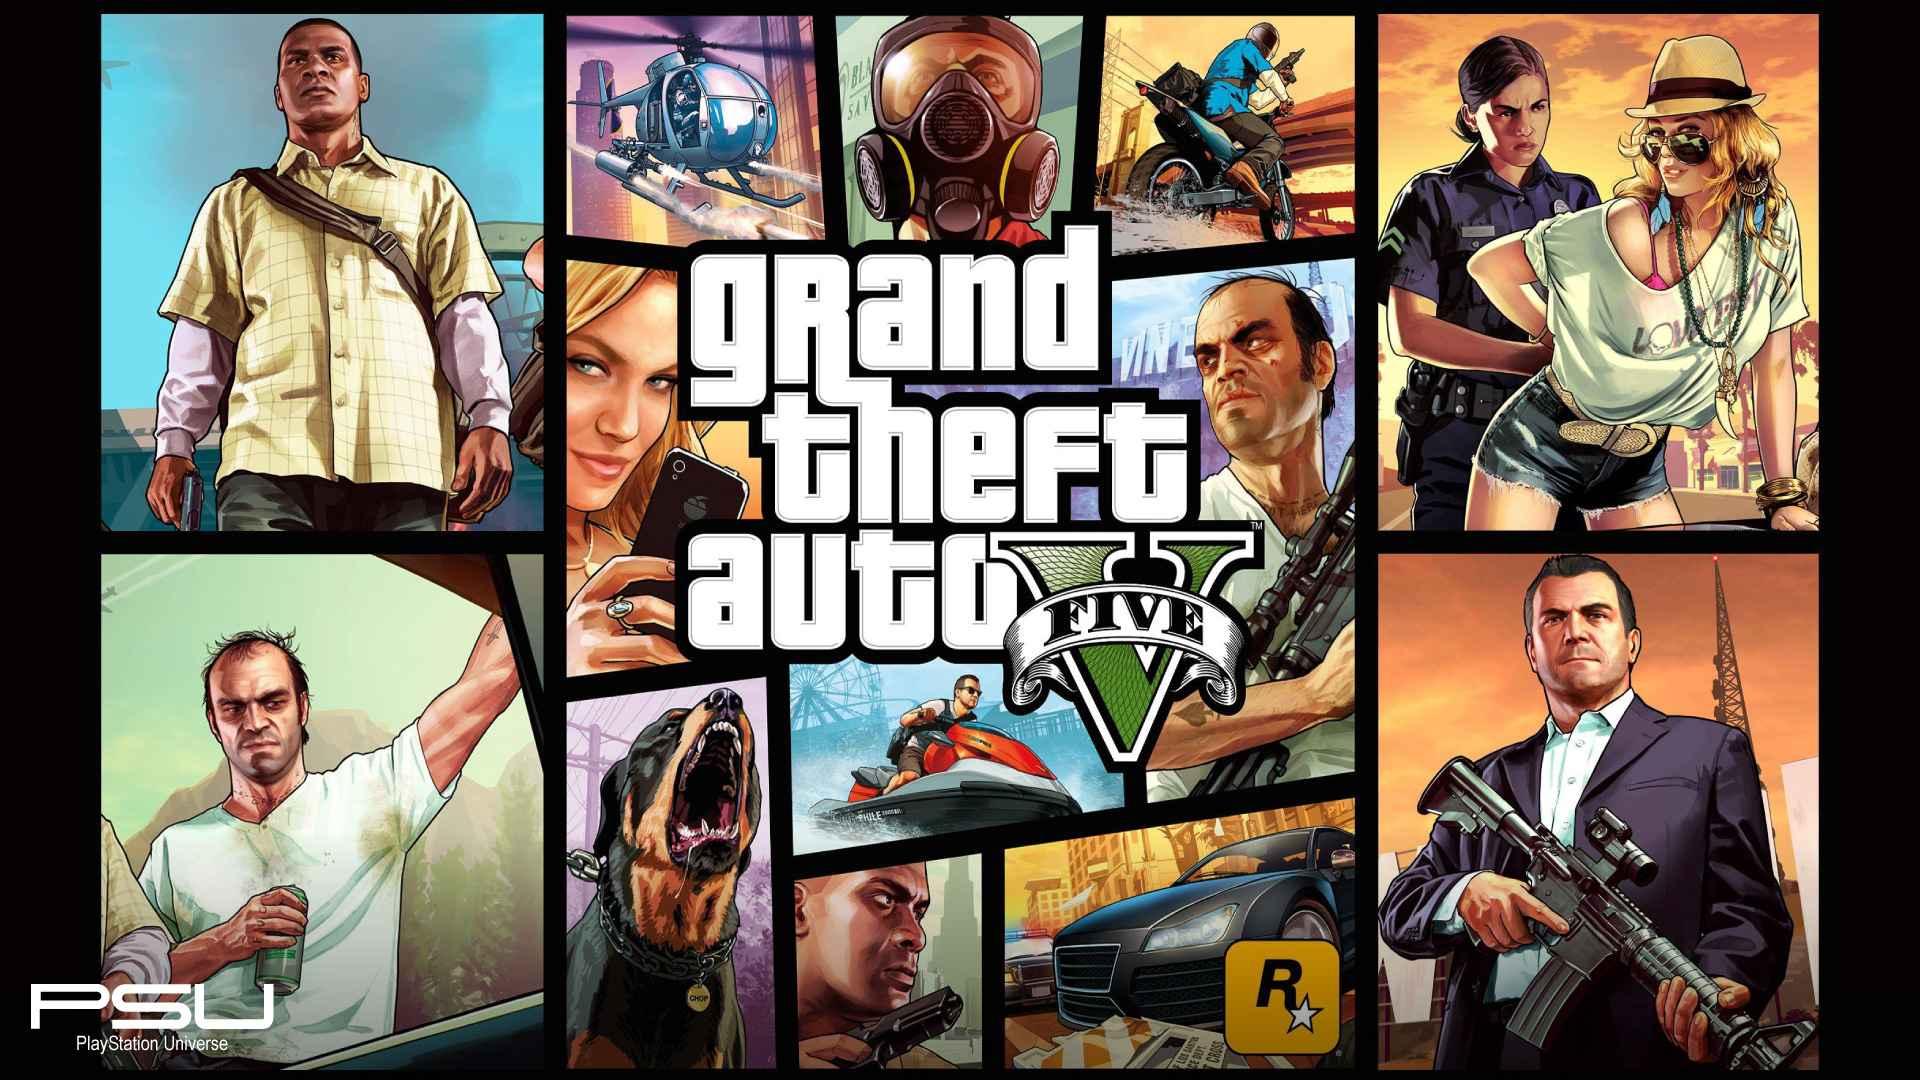 Grand Theft Auto 5 PlayStation Wallpaper